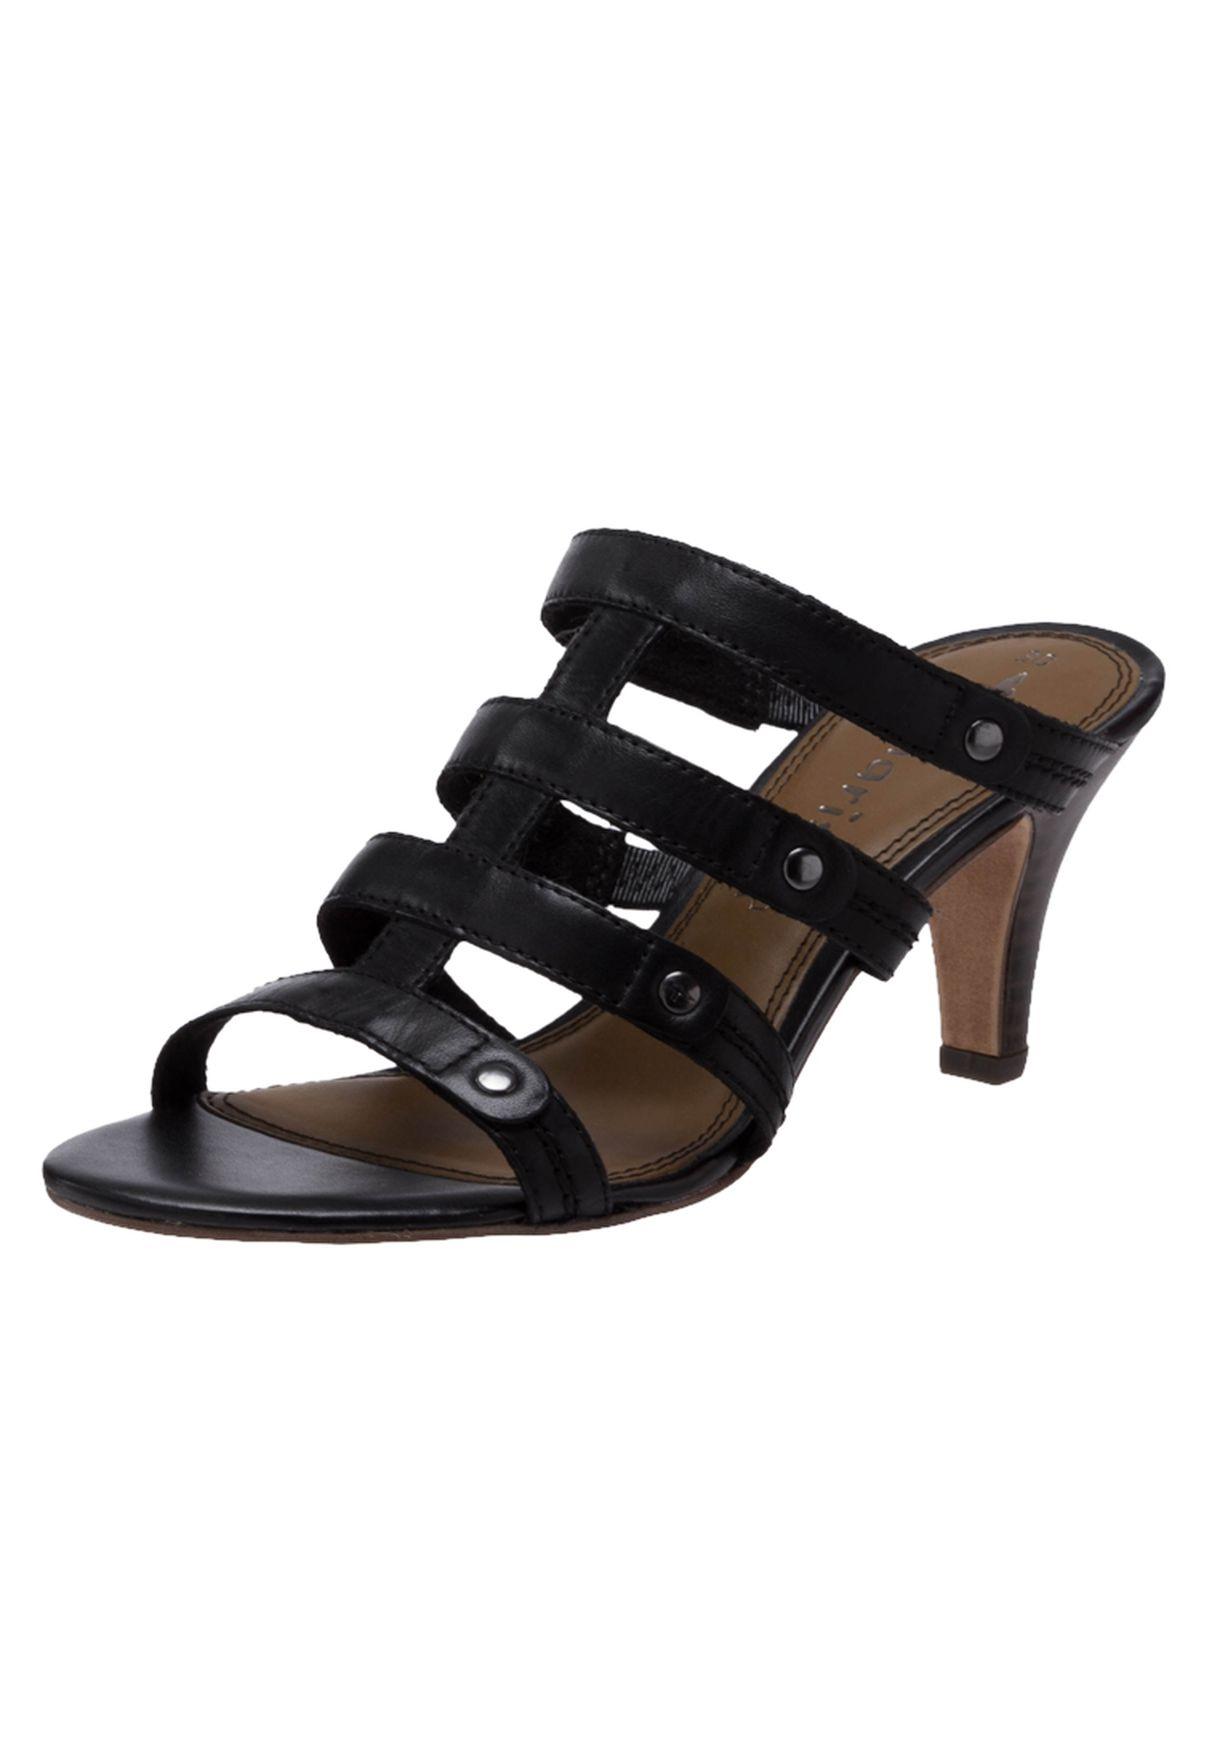 9d703cef46dc Shop Tamaris black Leather Midheel Sandals for Women in Oman - TA144SH71XHW